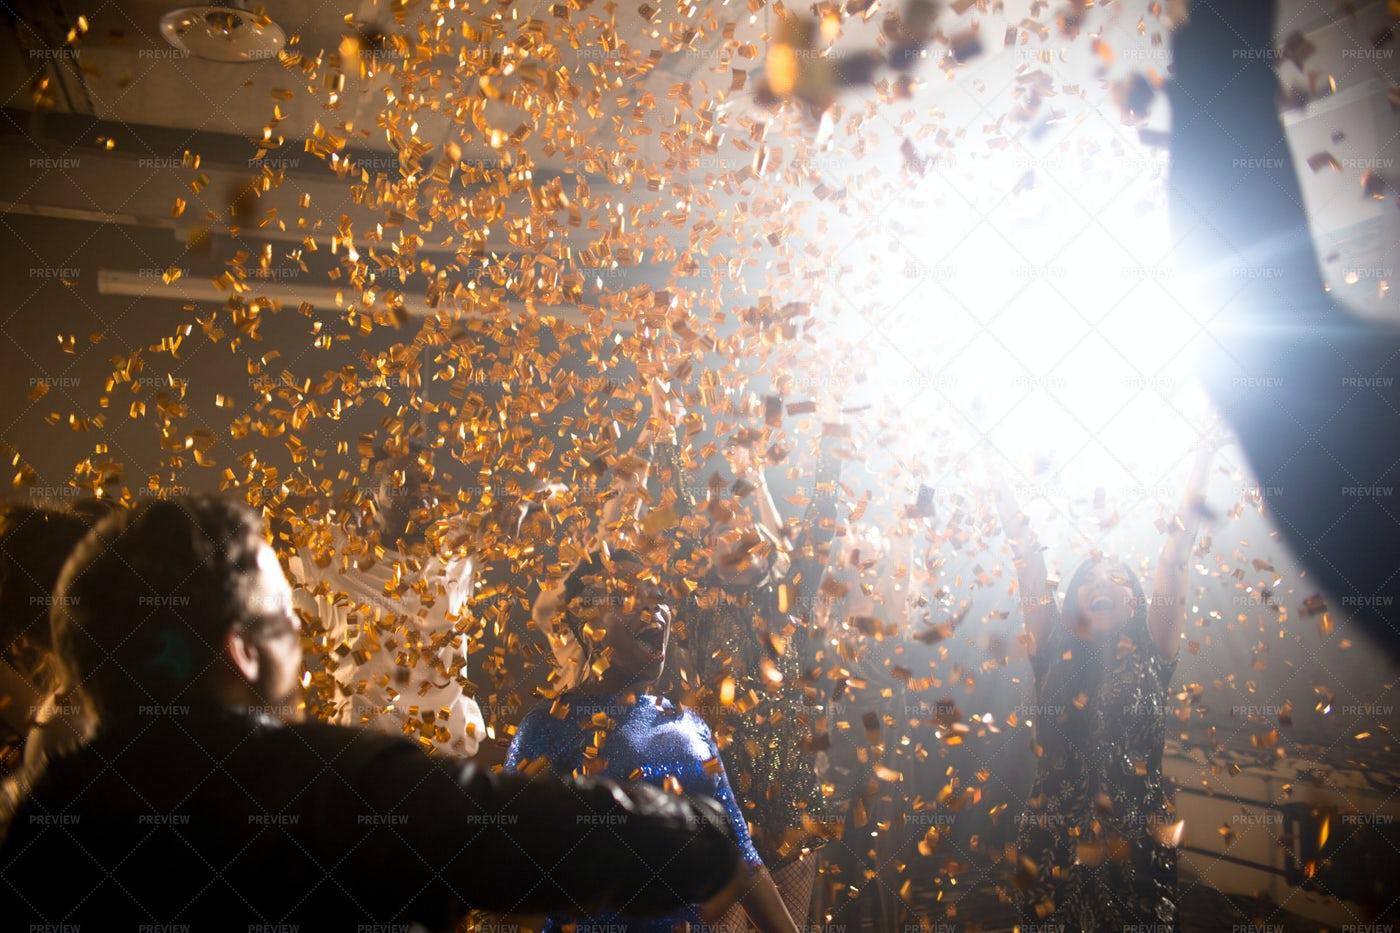 Confetti Burst At Nightclub Party: Stock Photos